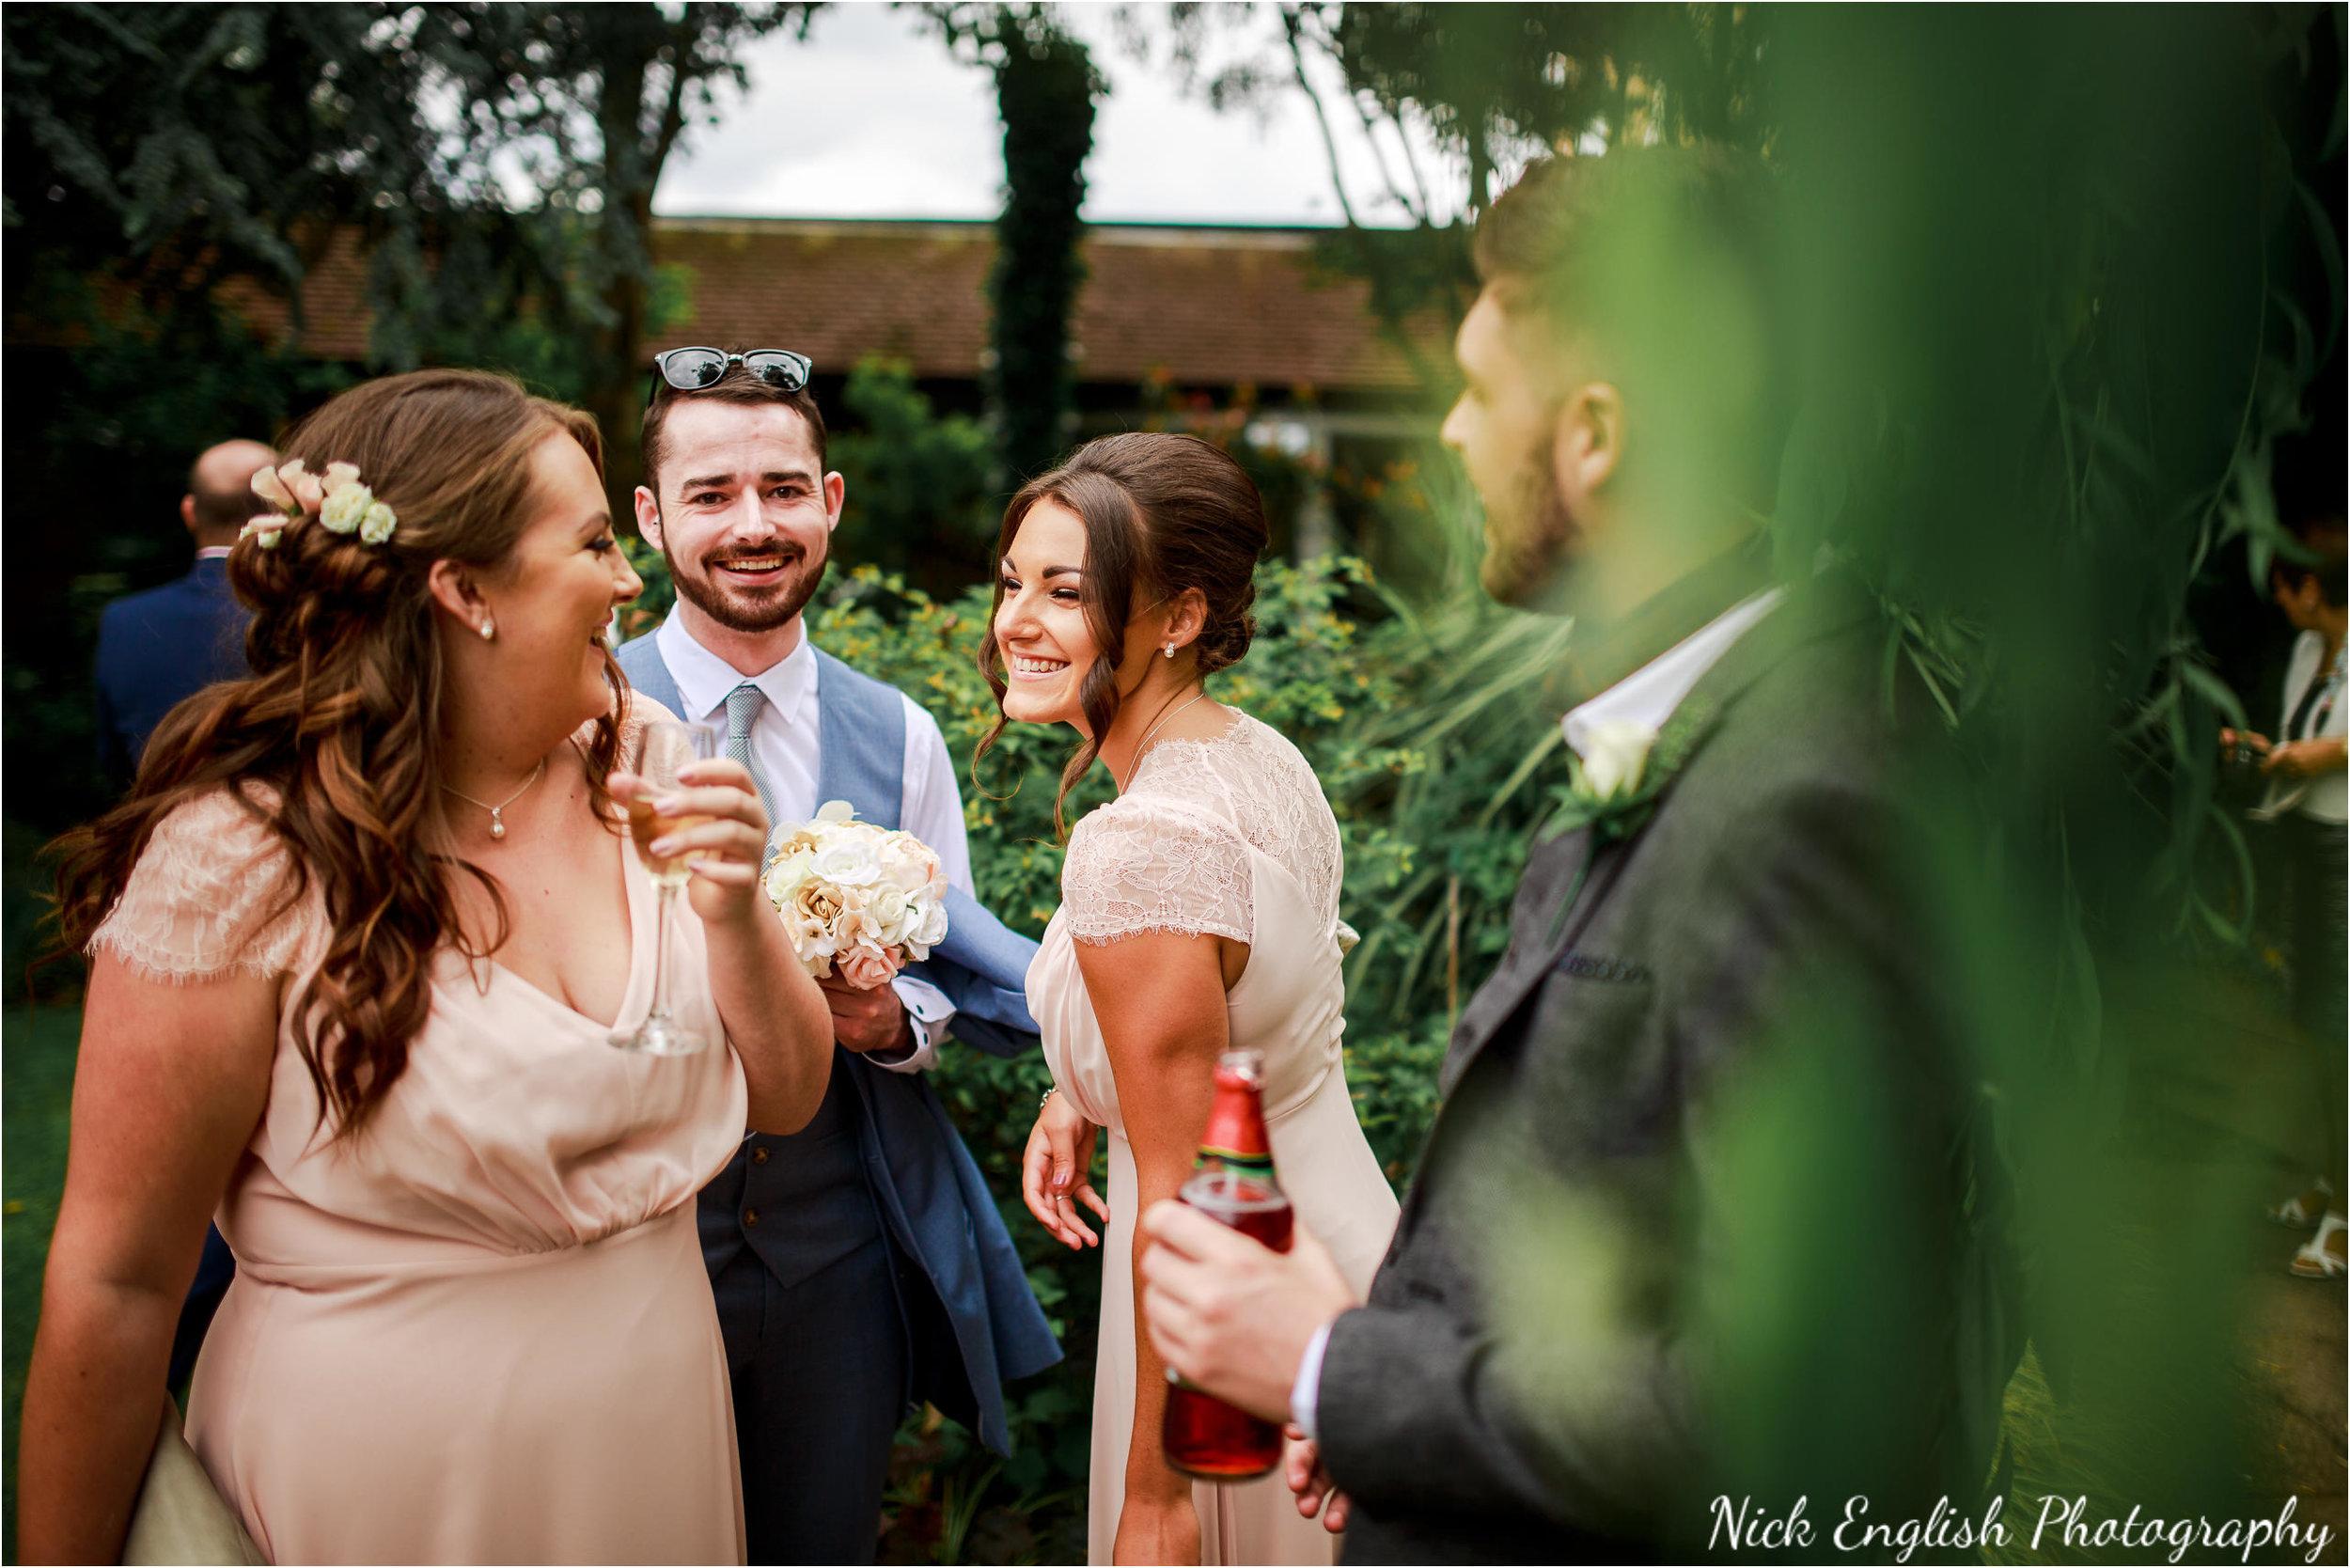 Emily David Wedding Photographs at Barton Grange Preston by Nick English Photography 136jpg.jpeg